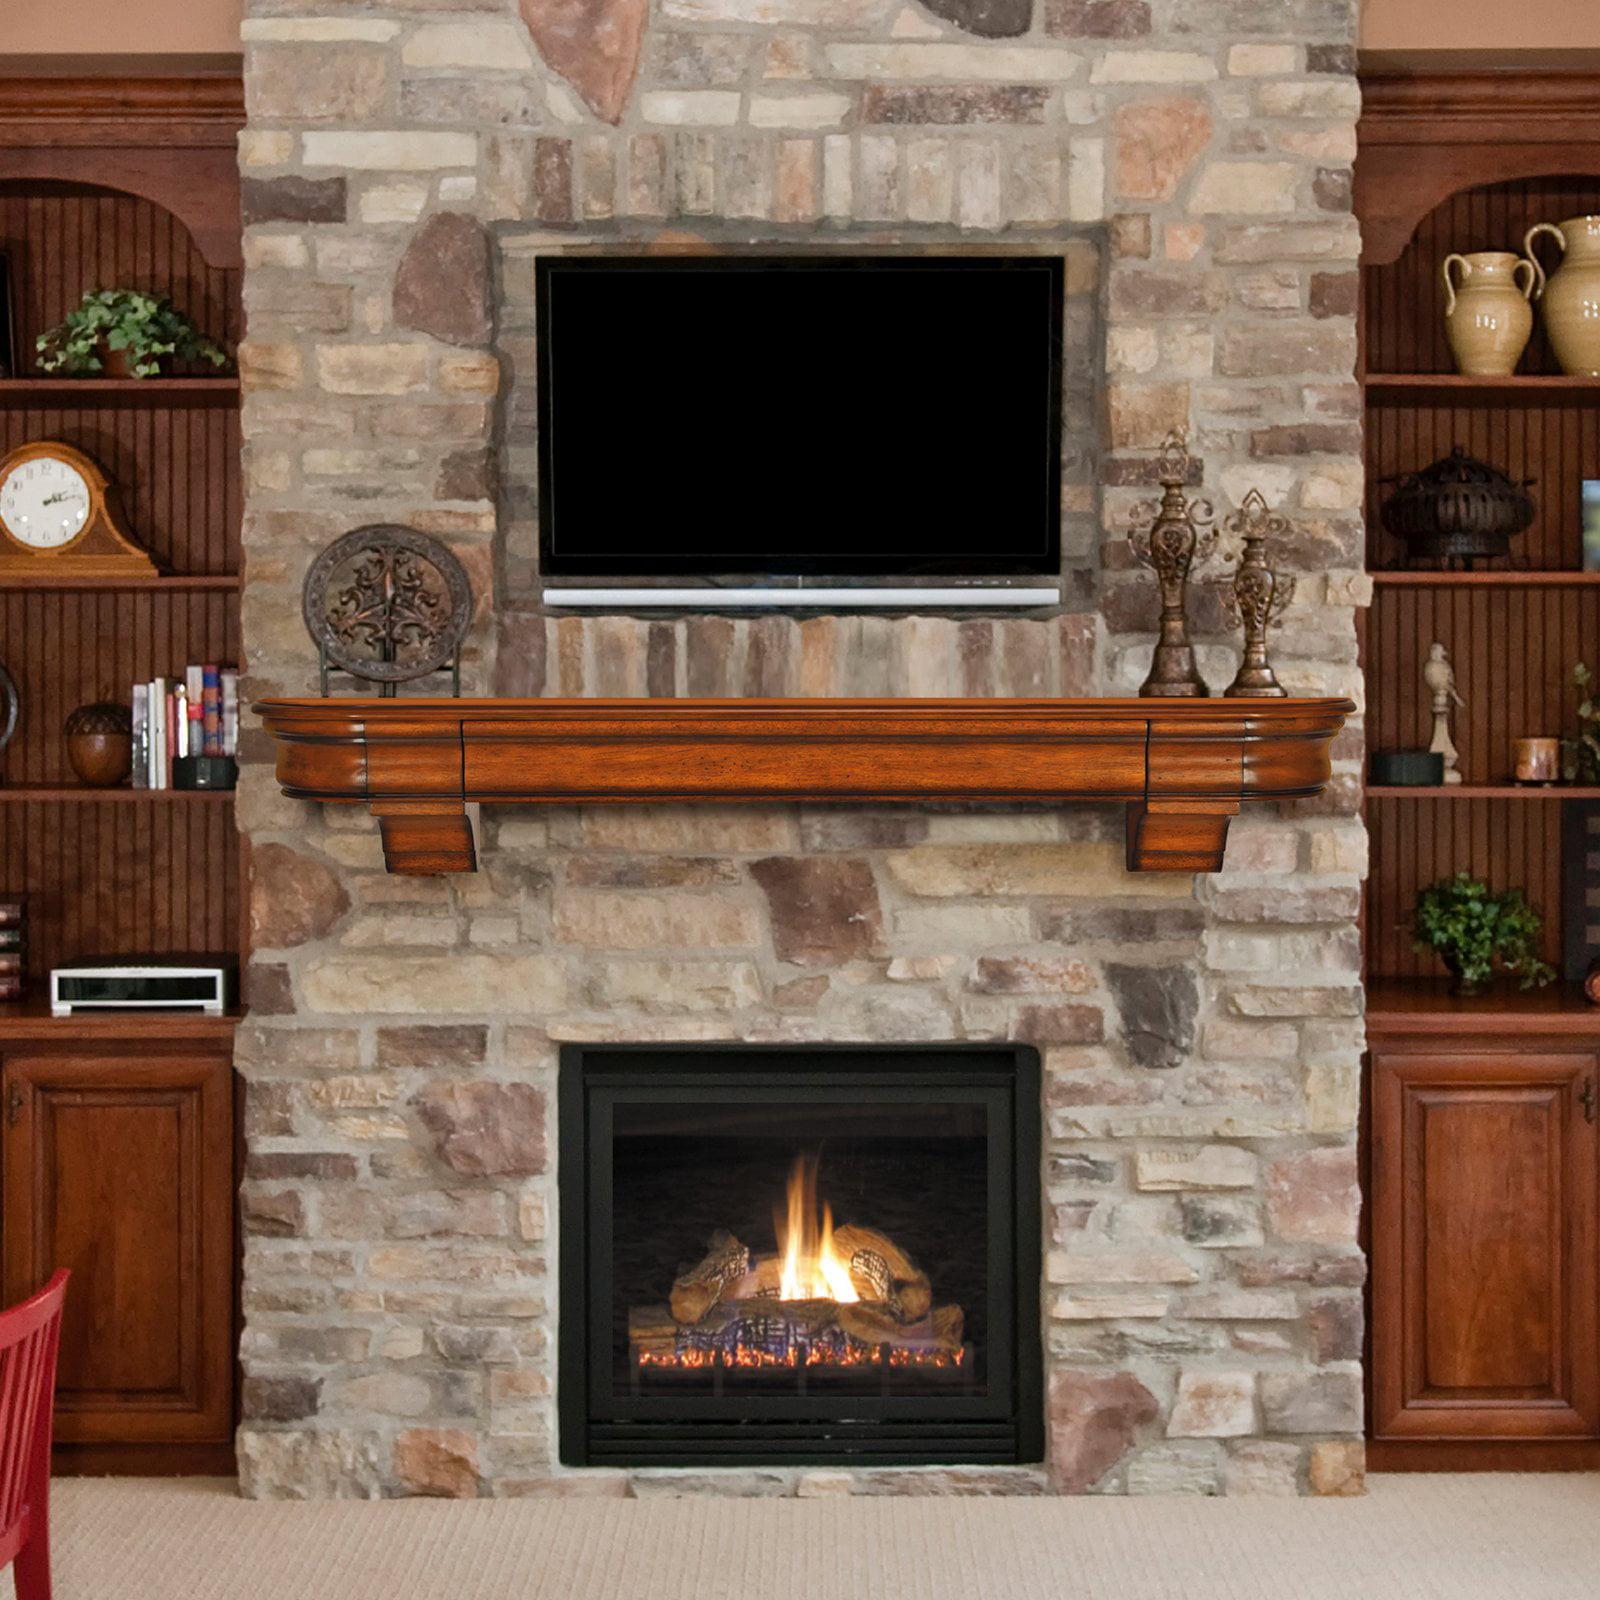 Free Shipping. Buy Pearl Mantels Abingdon Fireplace Mantel Shelf with Secret Drawer at Walmart.com